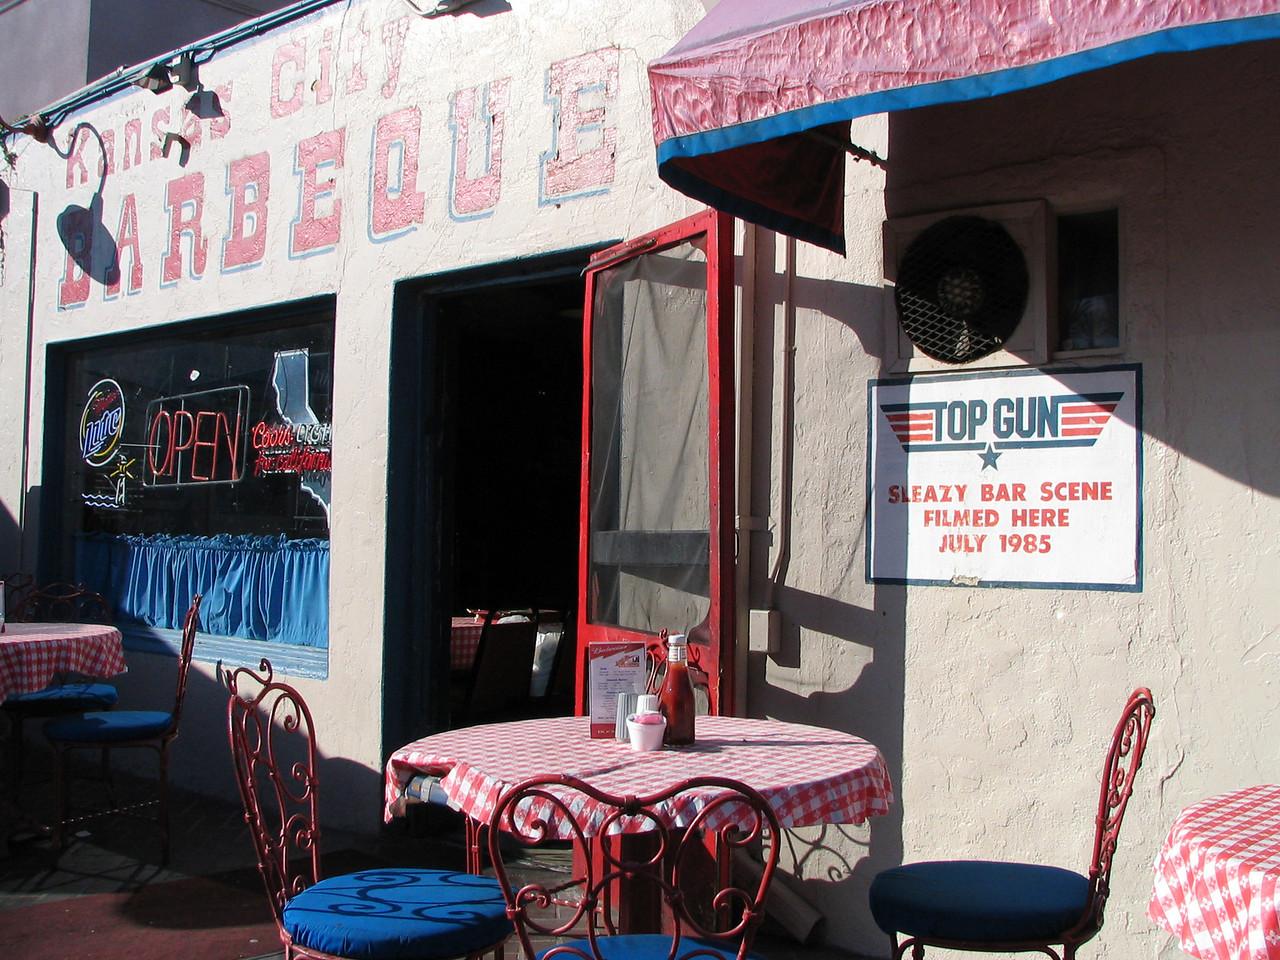 Sleazy Bar Scene In Top Gun, Was Filmed At Kansas City BBQ In Downtown San